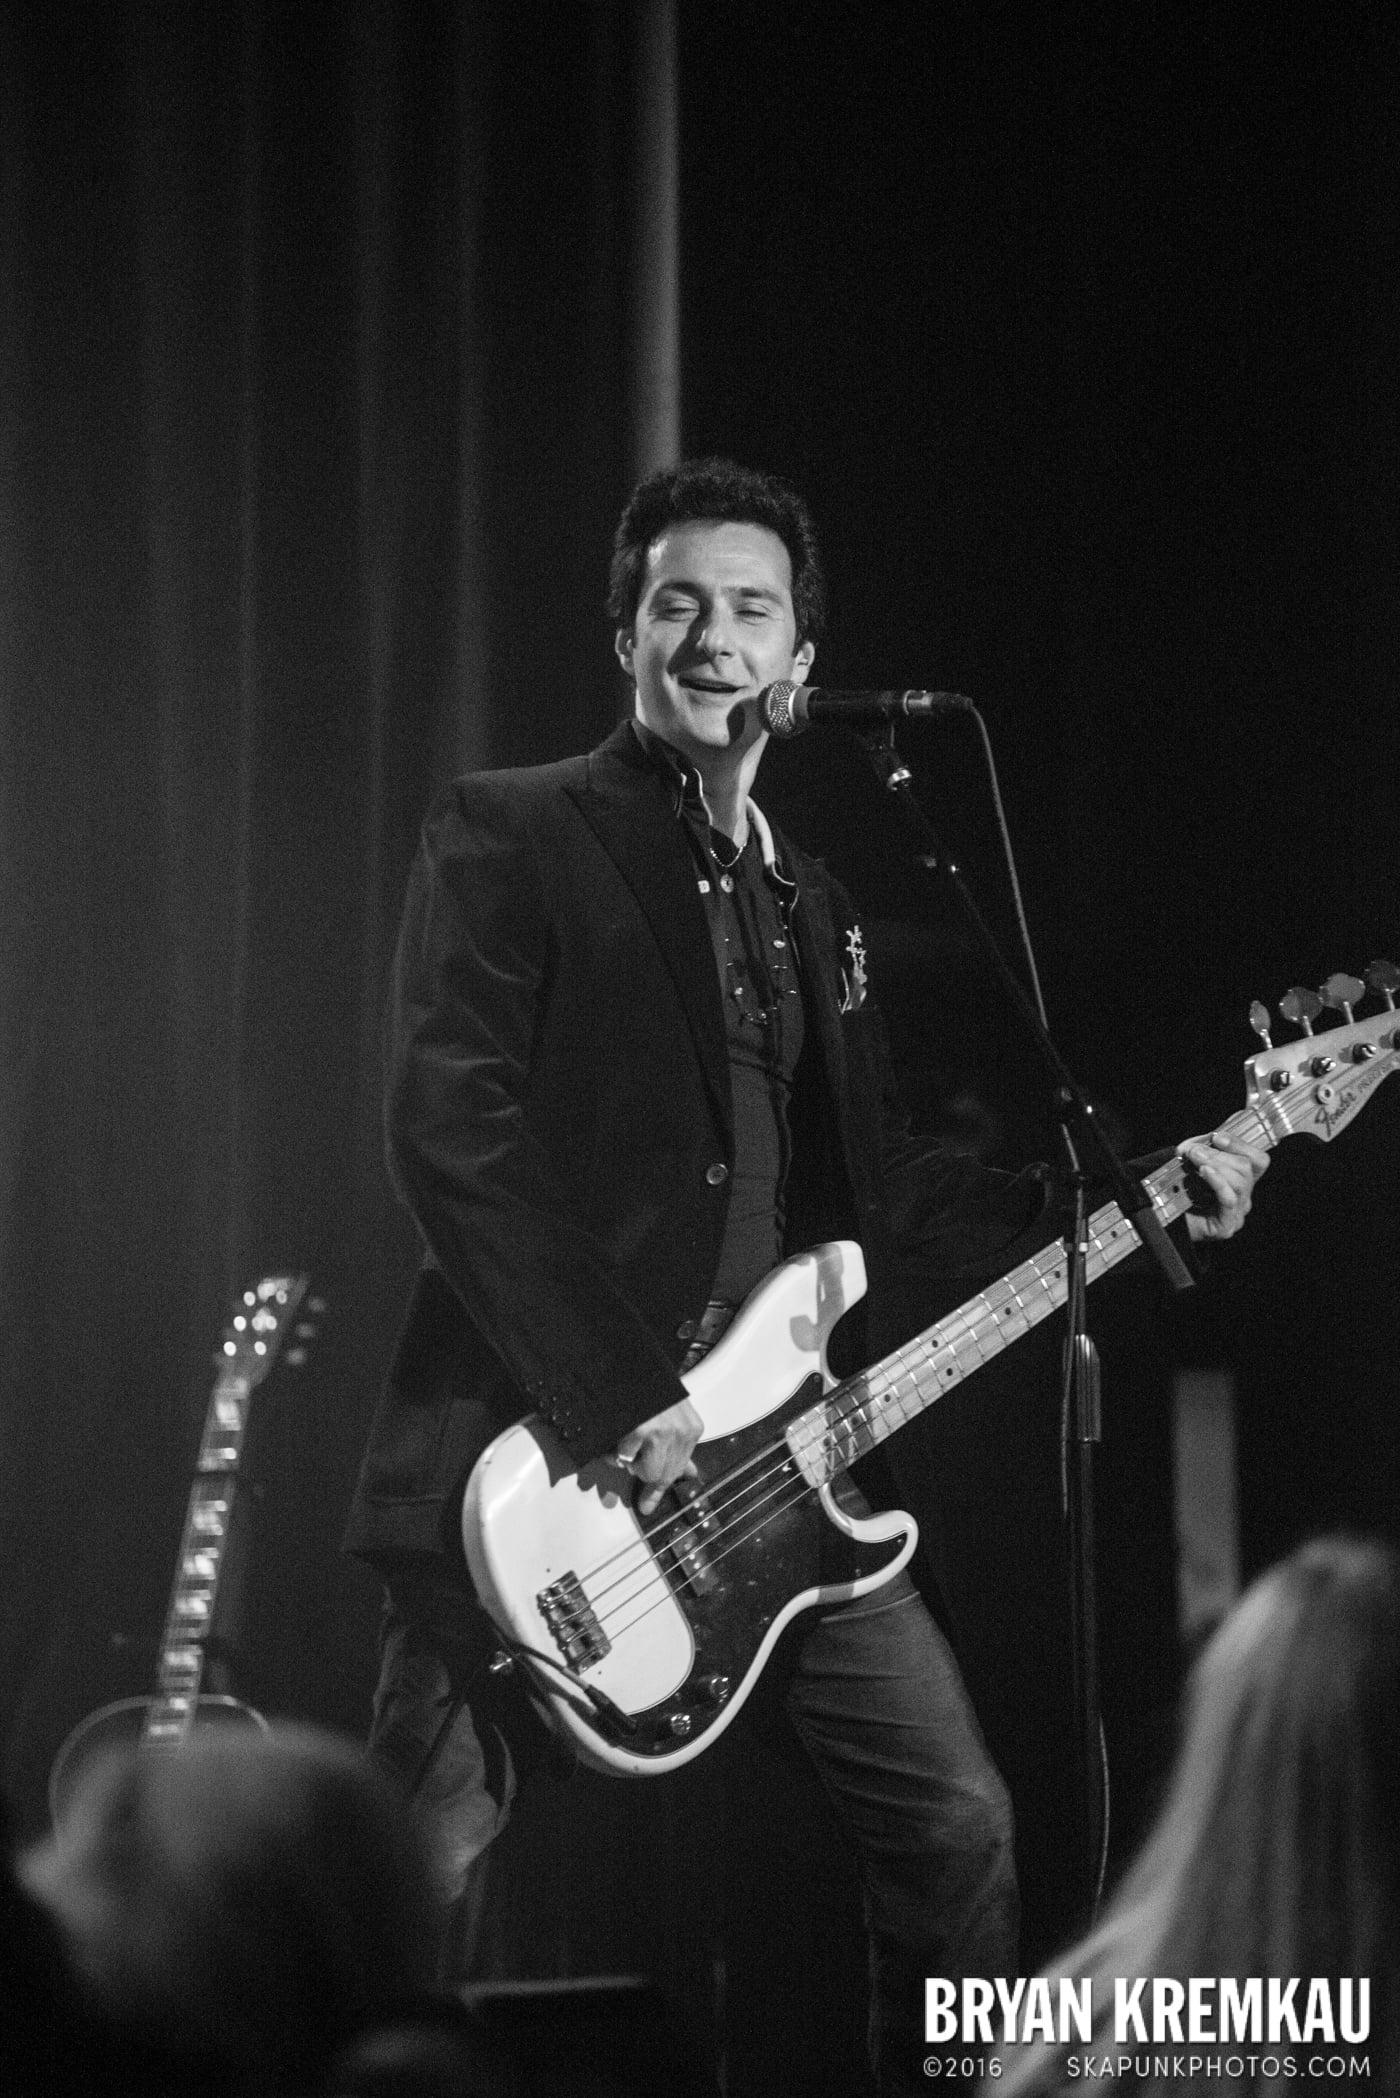 Willie Nile @ Highline Ballroom, NYC - 12.26.14 (75)